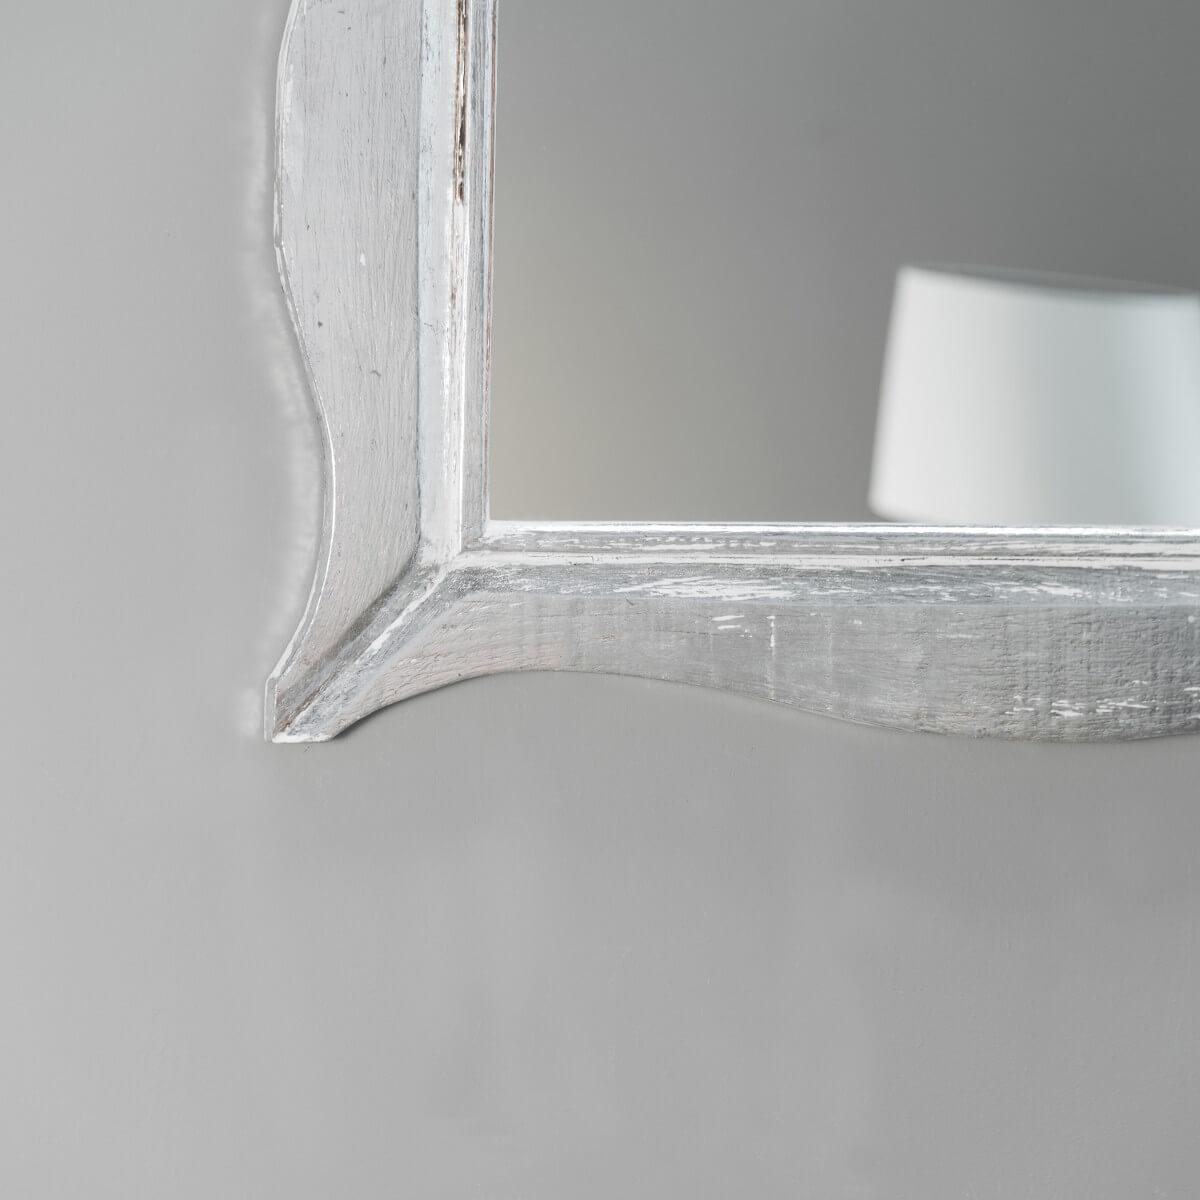 Miroir moderne en bois patin blanc argent 70cm x 100cm for Miroir moderne